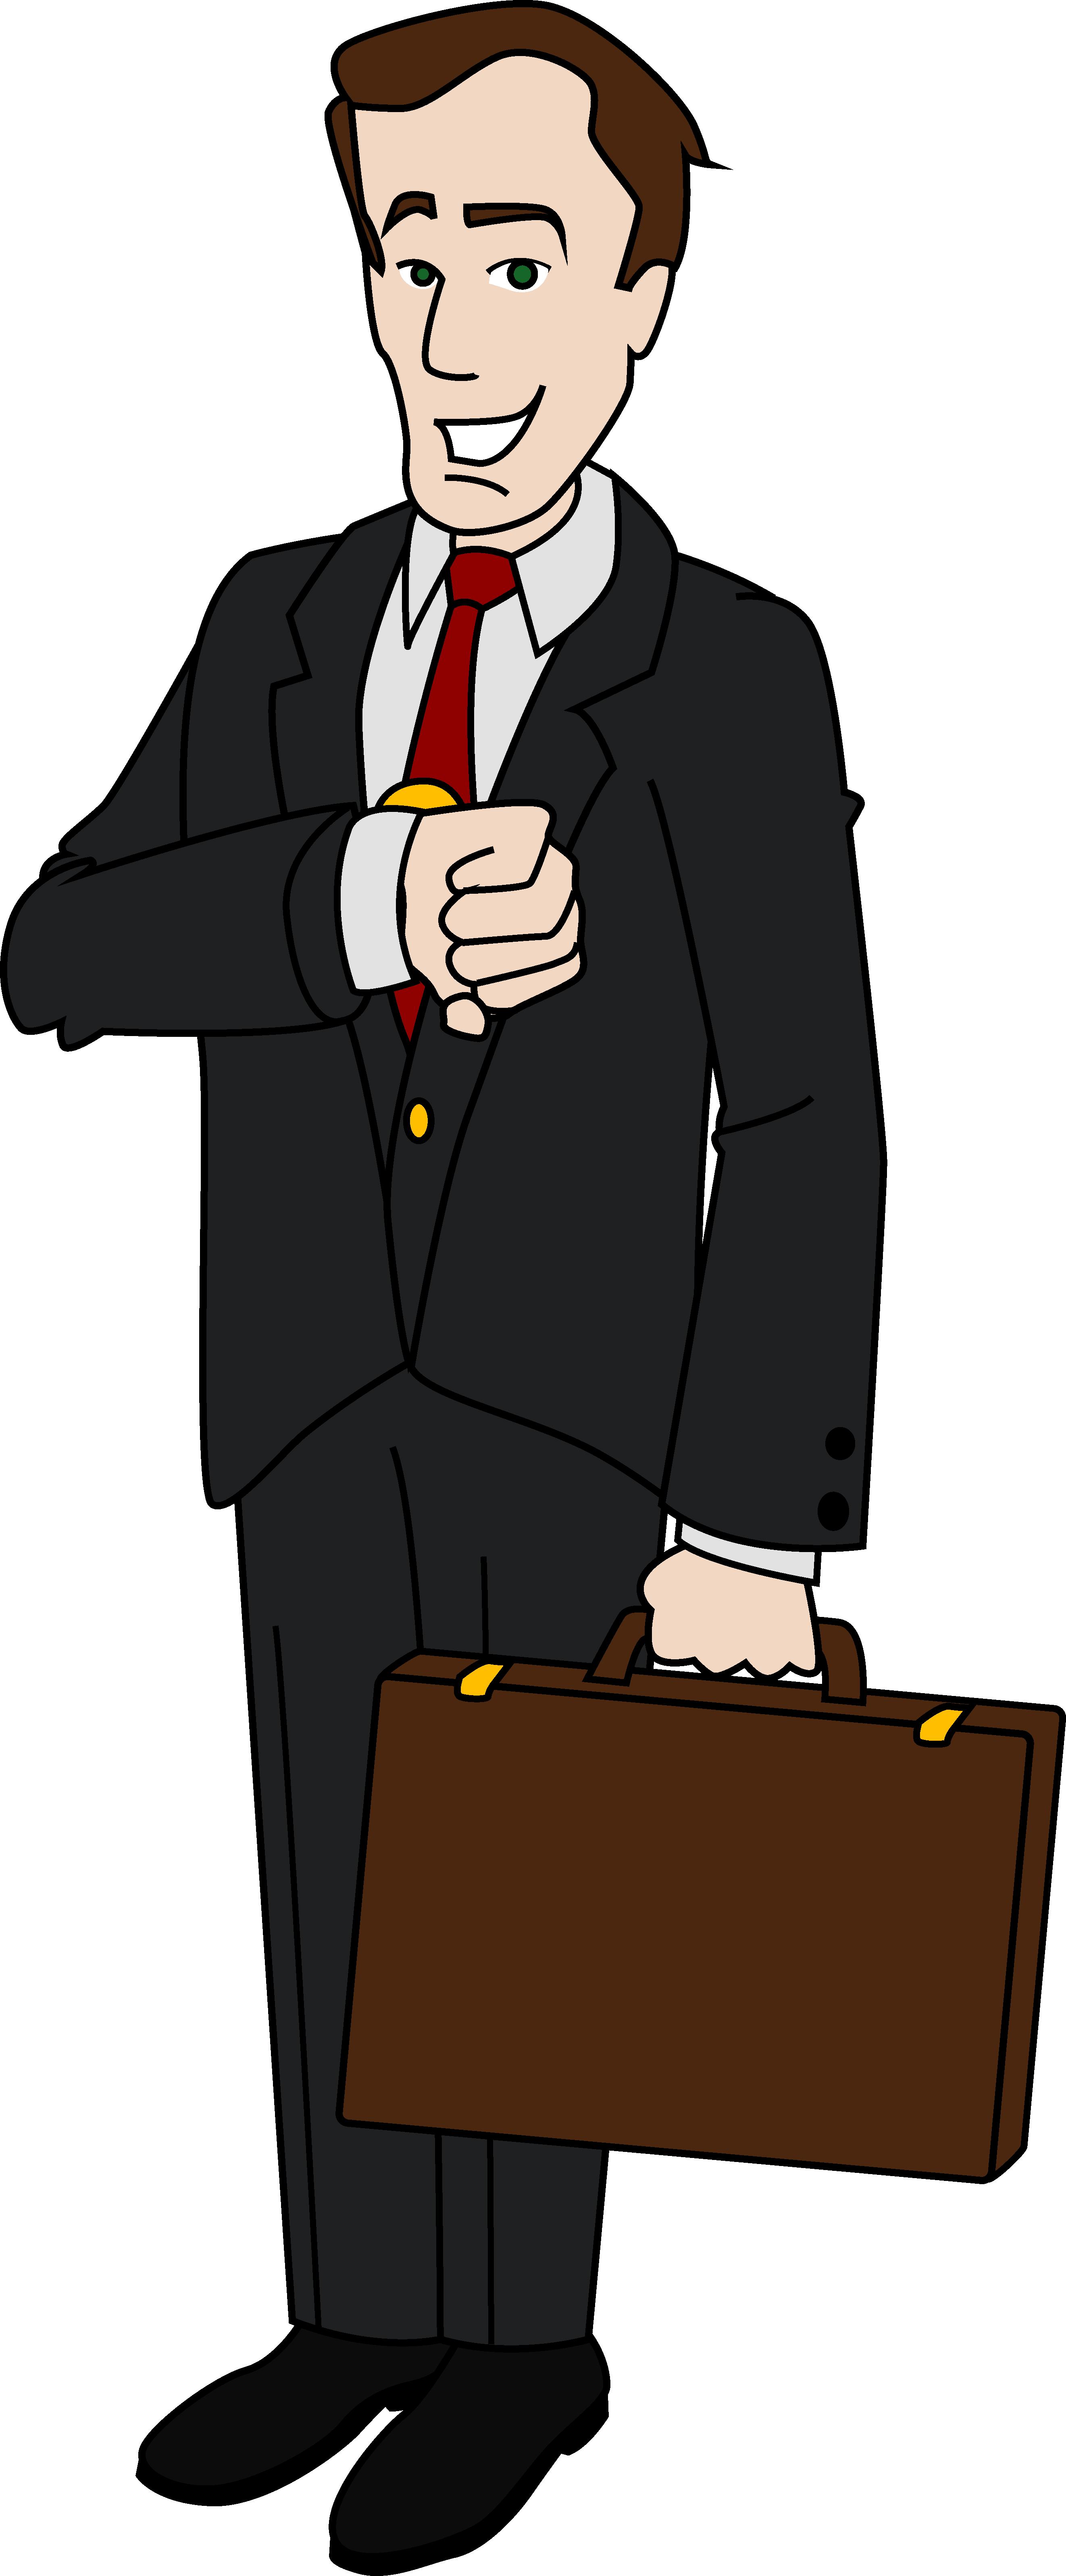 Free Businessman Cliparts, Download Free Clip Art, Free Clip.